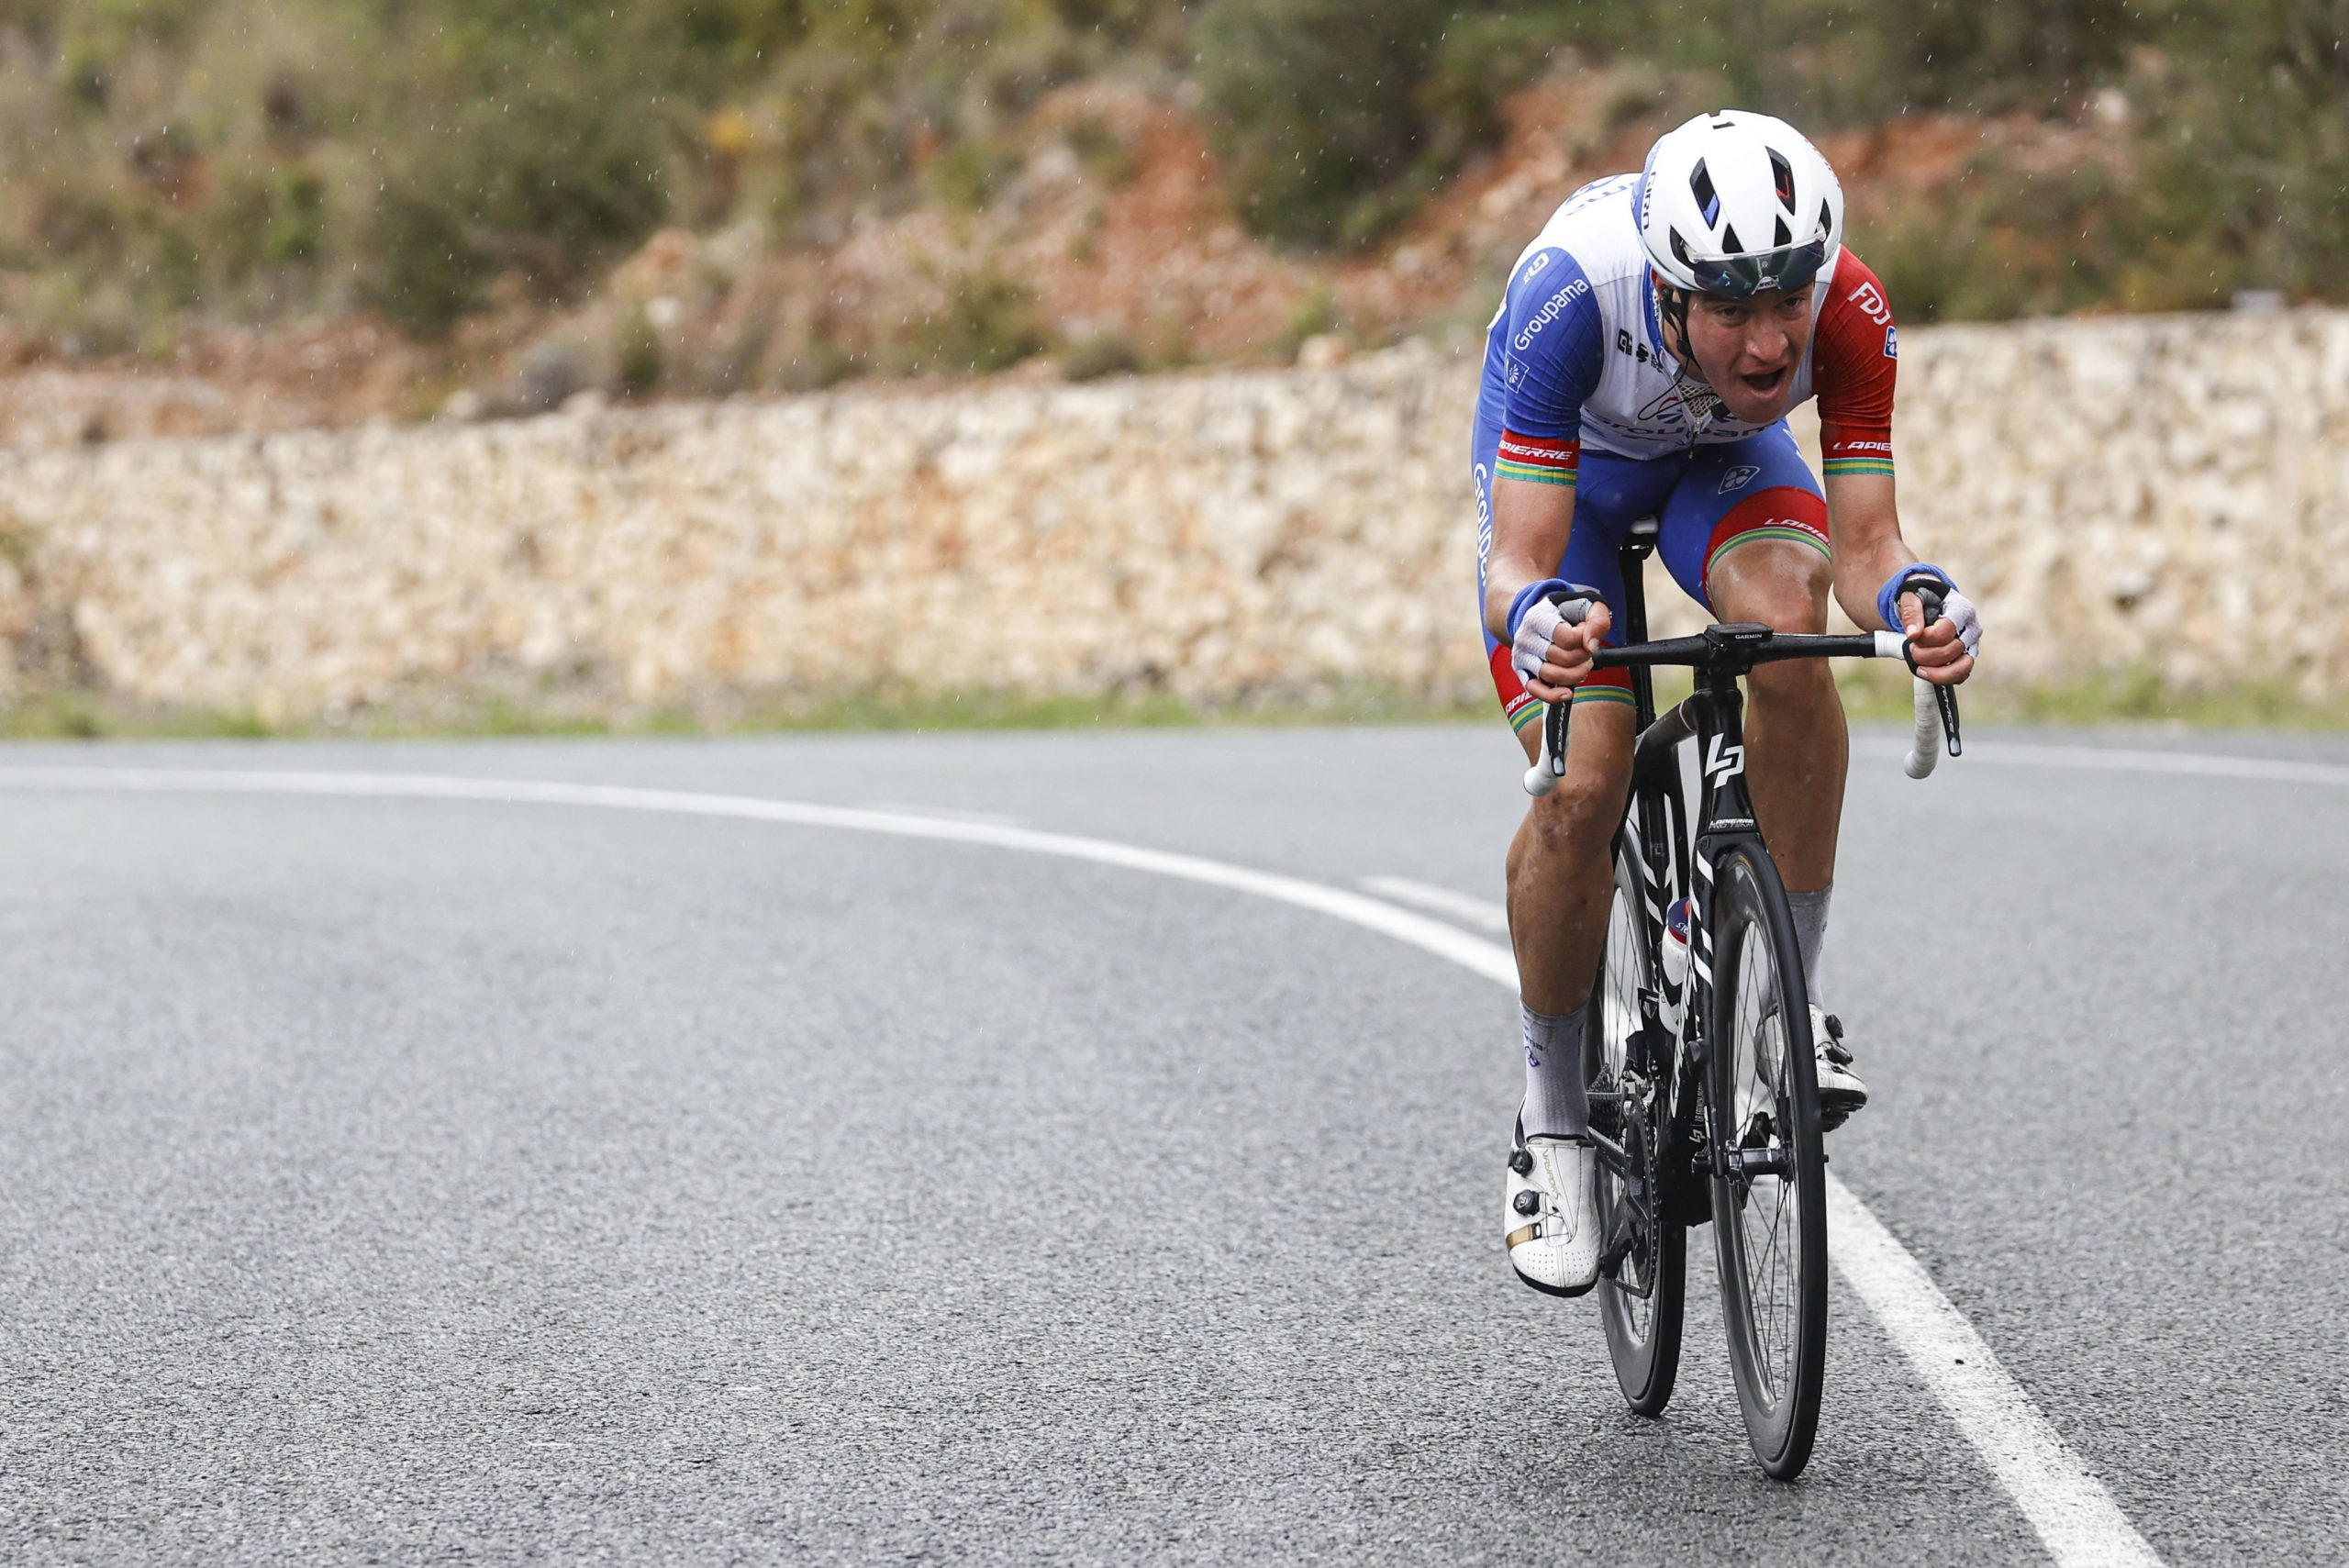 Miles Scotson ataca, cai e ainda vence etapa da Comunitat Valenciana!